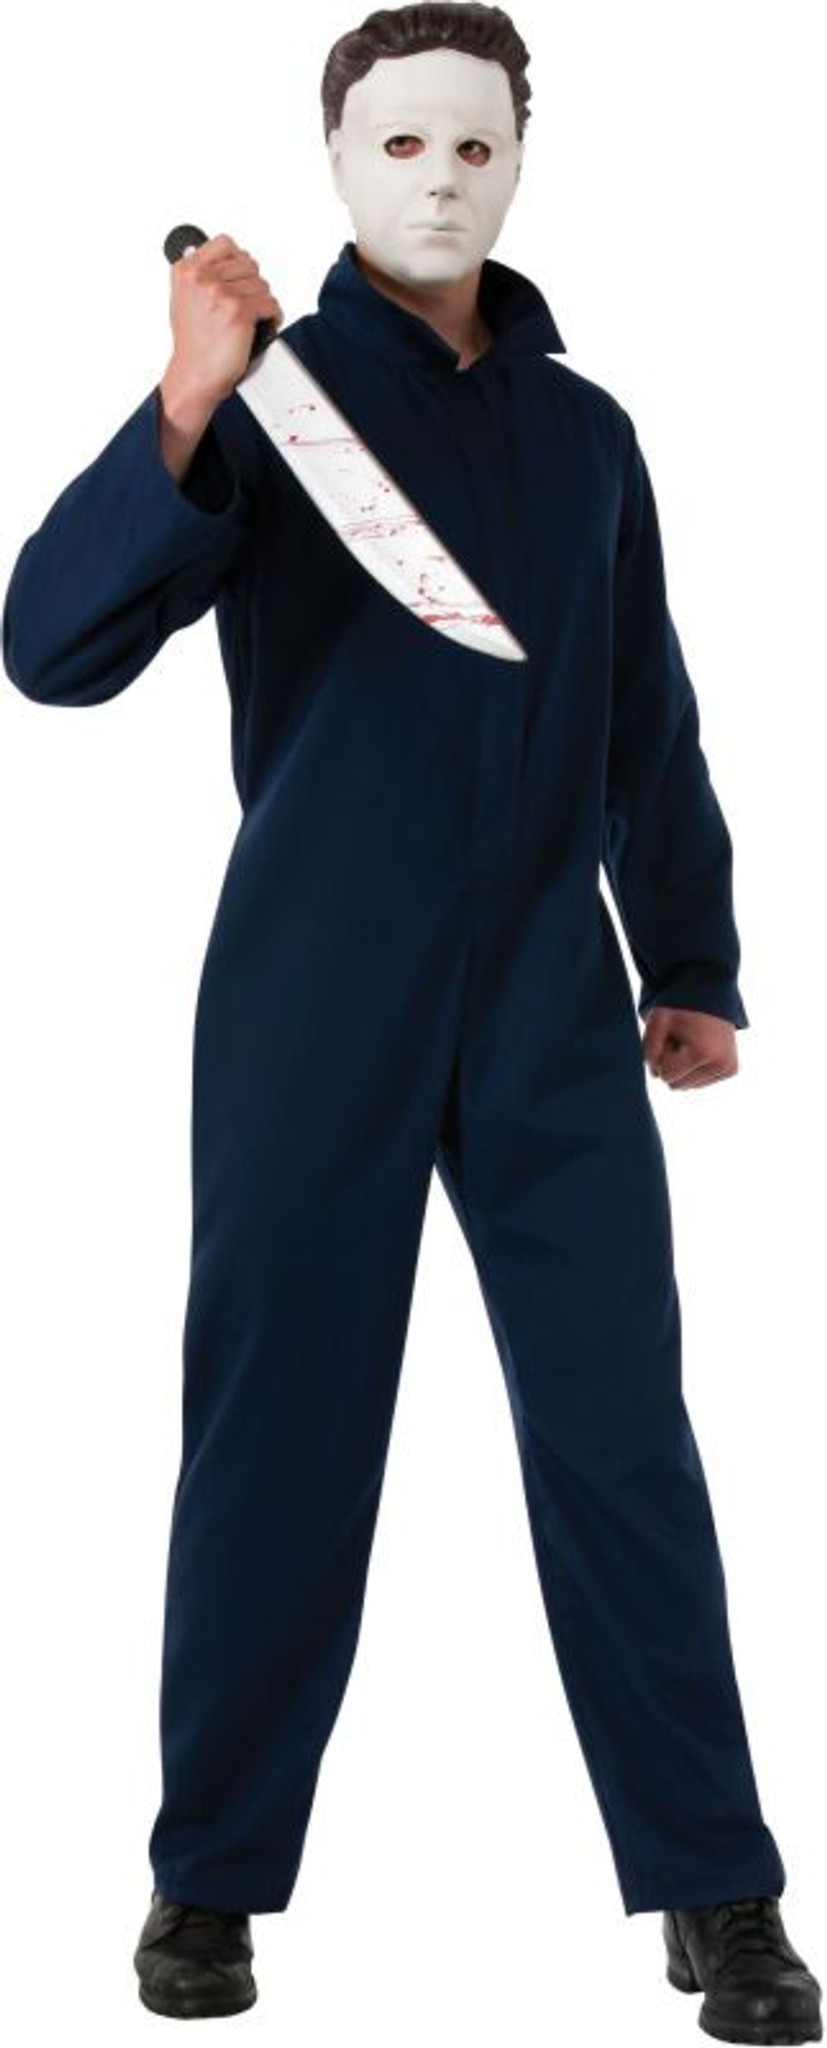 Halloween Michael Myers Costume.Halloween Licensed Deluxe Adult Michael Myers Costume